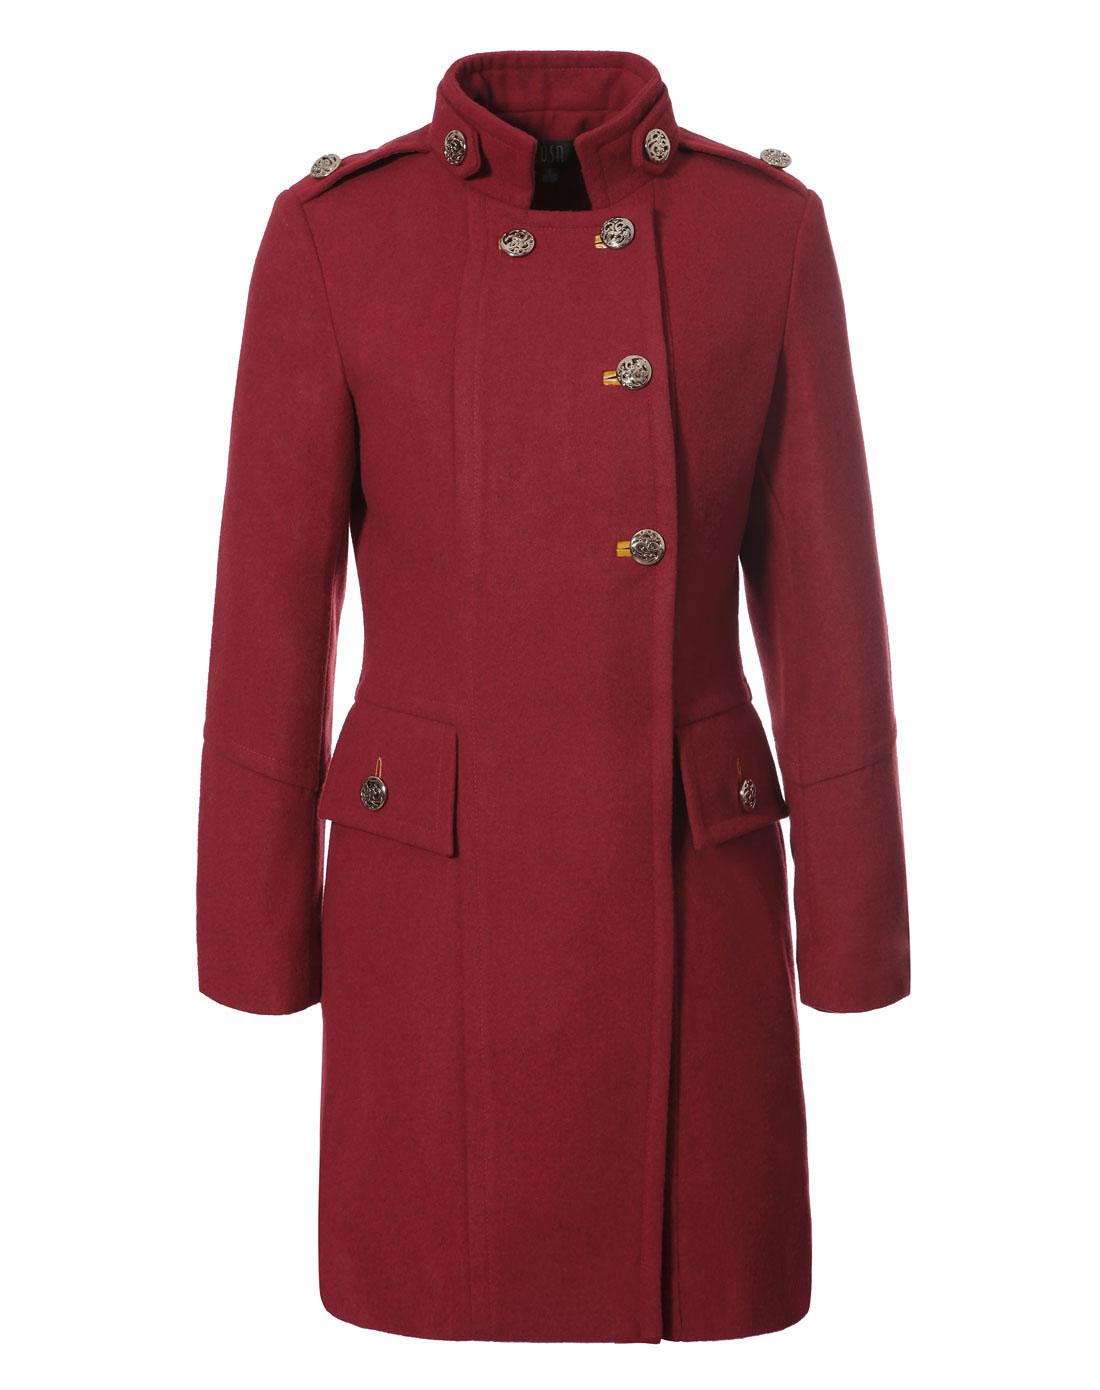 sa枣红色羊毛呢大衣sd236524500a